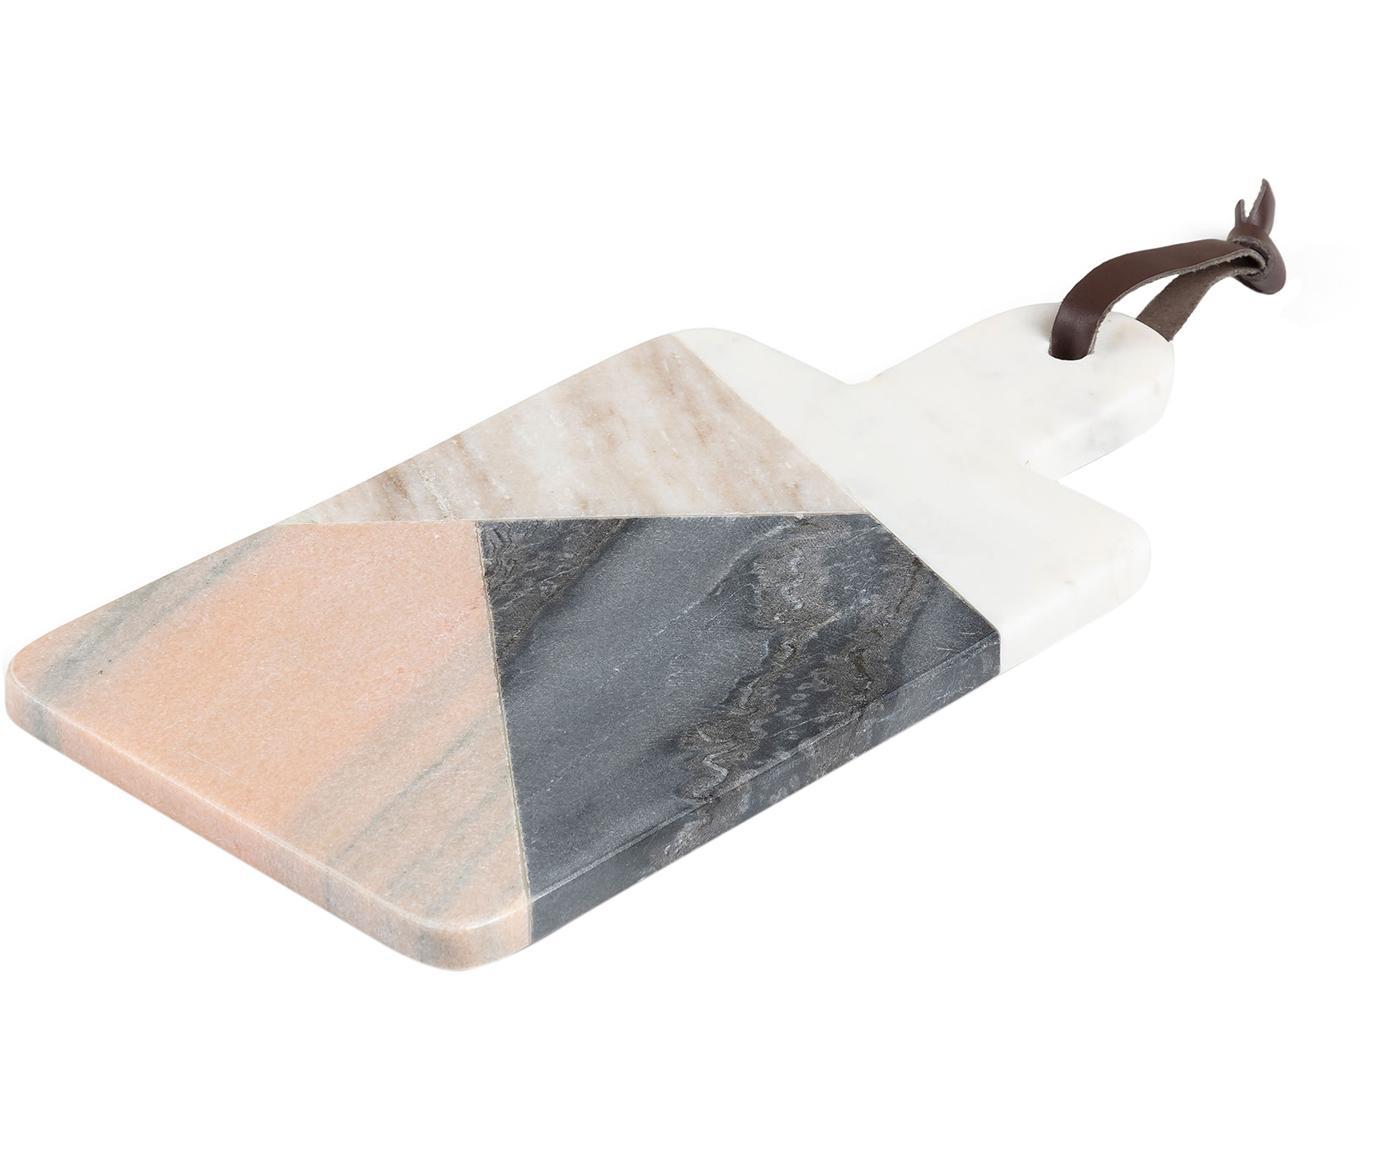 Marmor-Schneidebrett Bradney, Keramik, Marmor, Kunstleder, Mehrfarbig, B 15 x T 30 cm